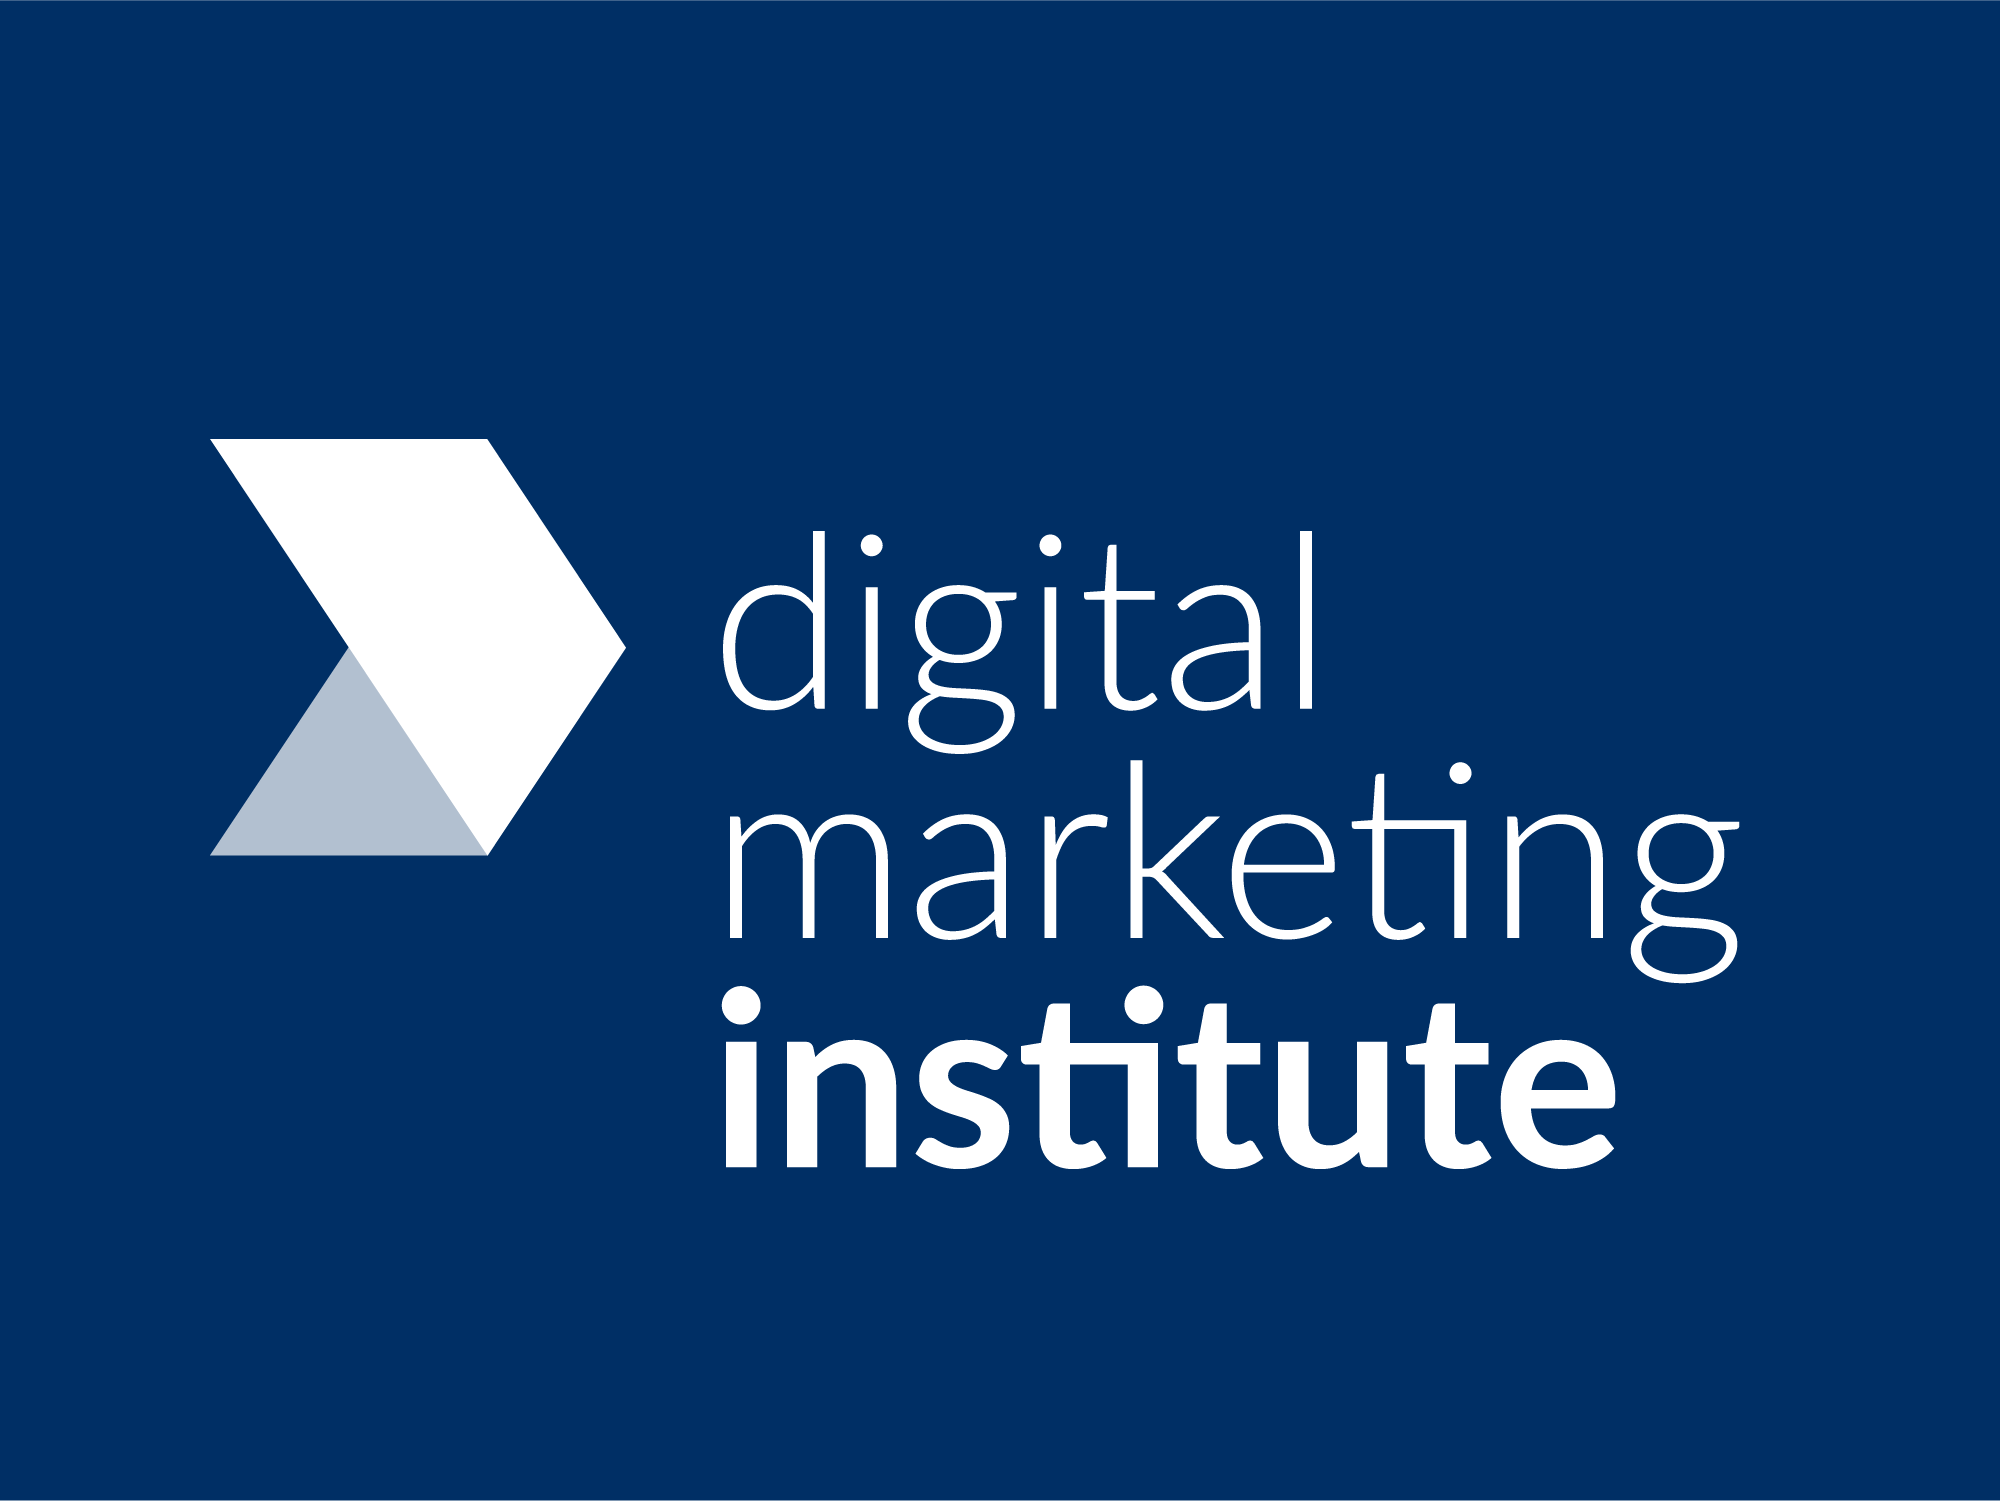 Digital Marketing Institute - Sale of Digital Marketing Institute to Spectrum Equity